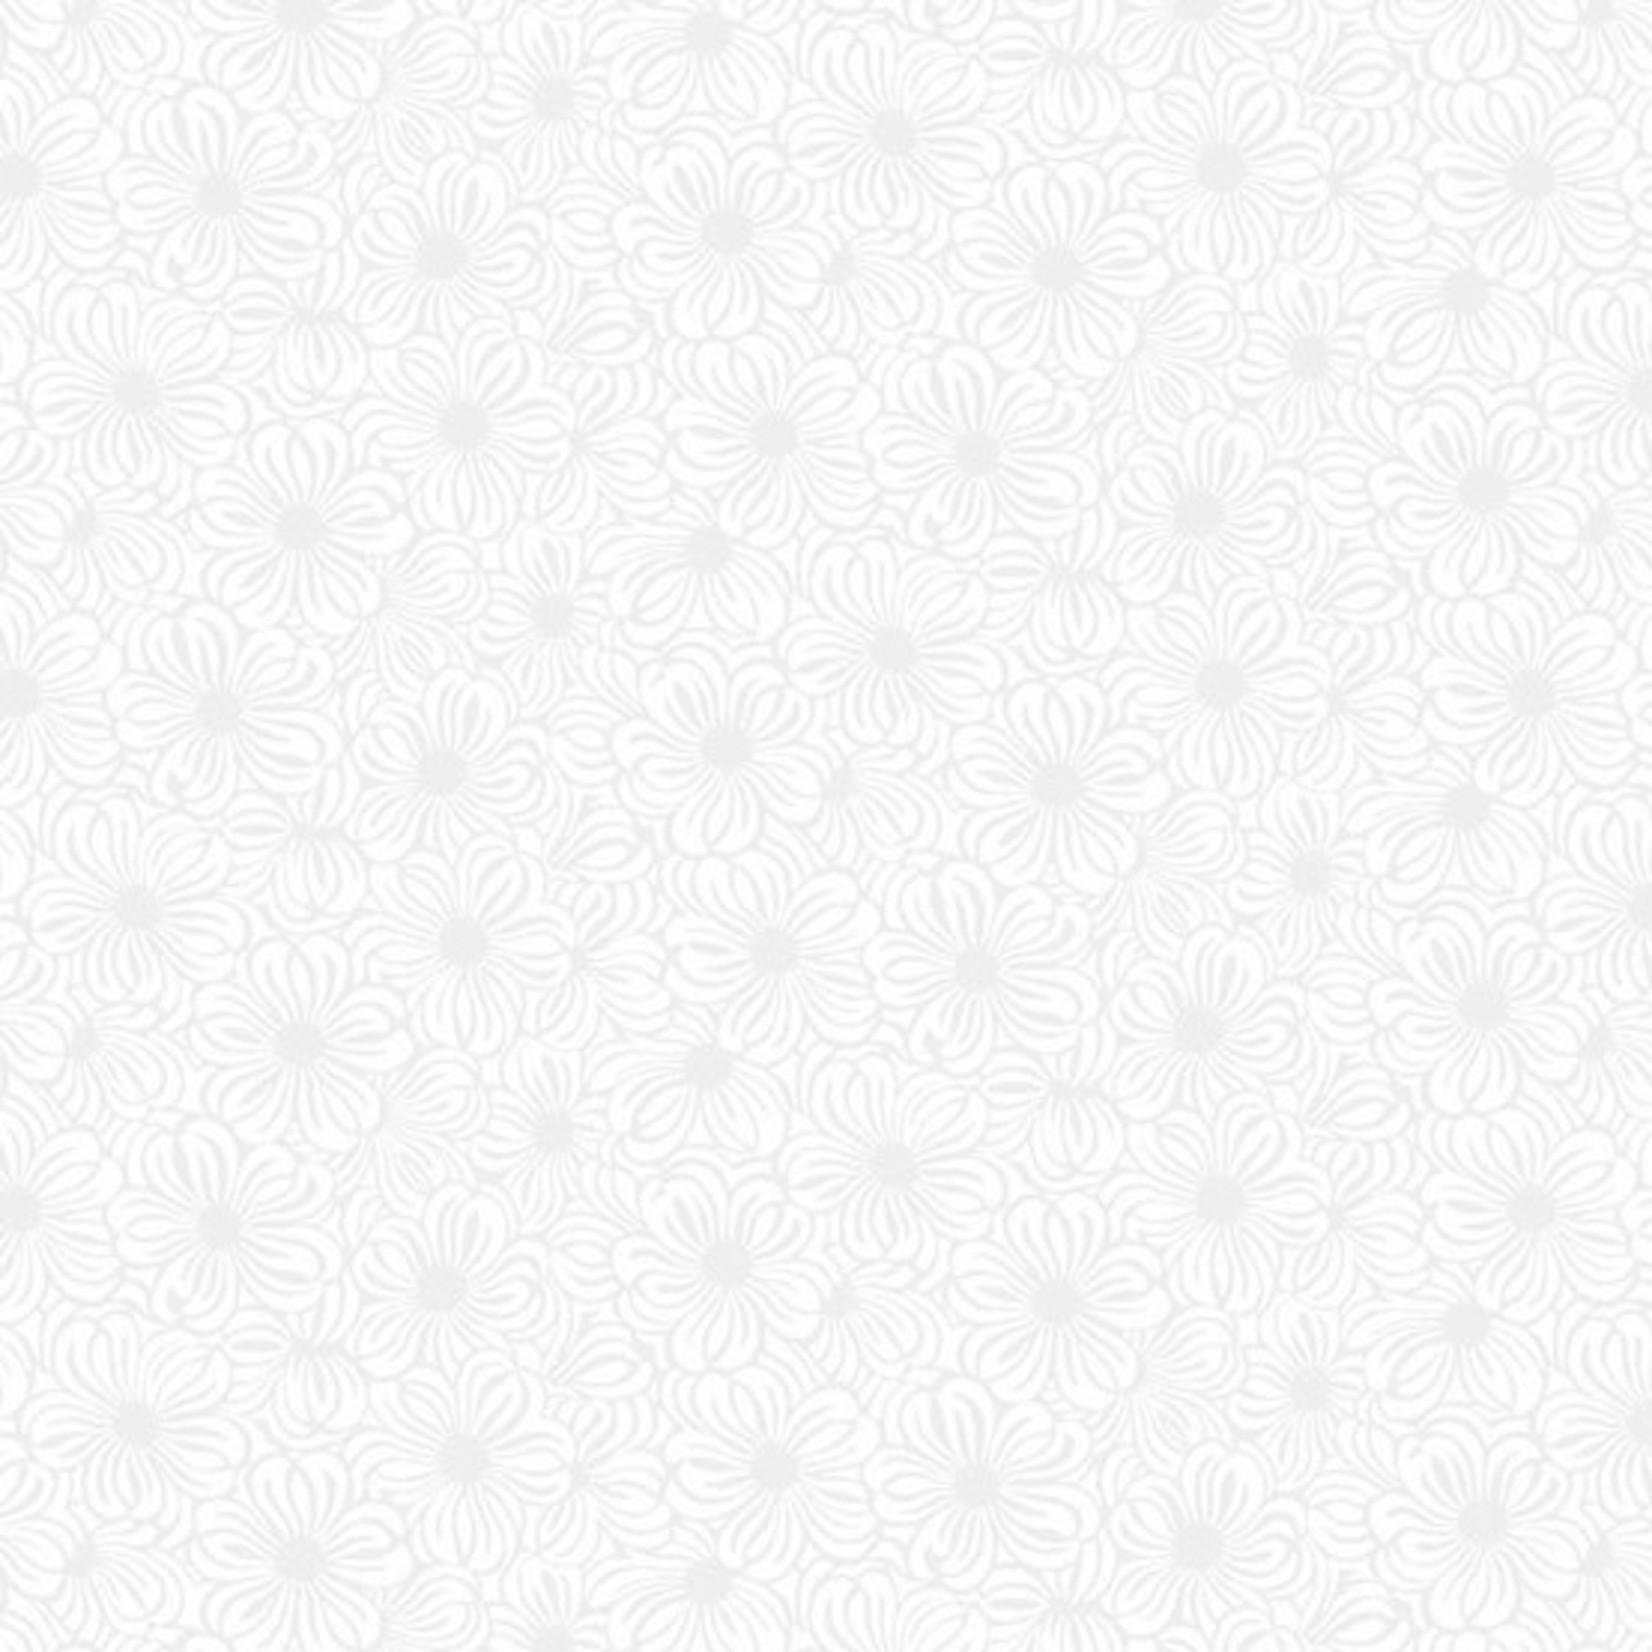 ANDOVER Century Whites, Daisy CS-9675-WW $0.18 per cm or $18/m